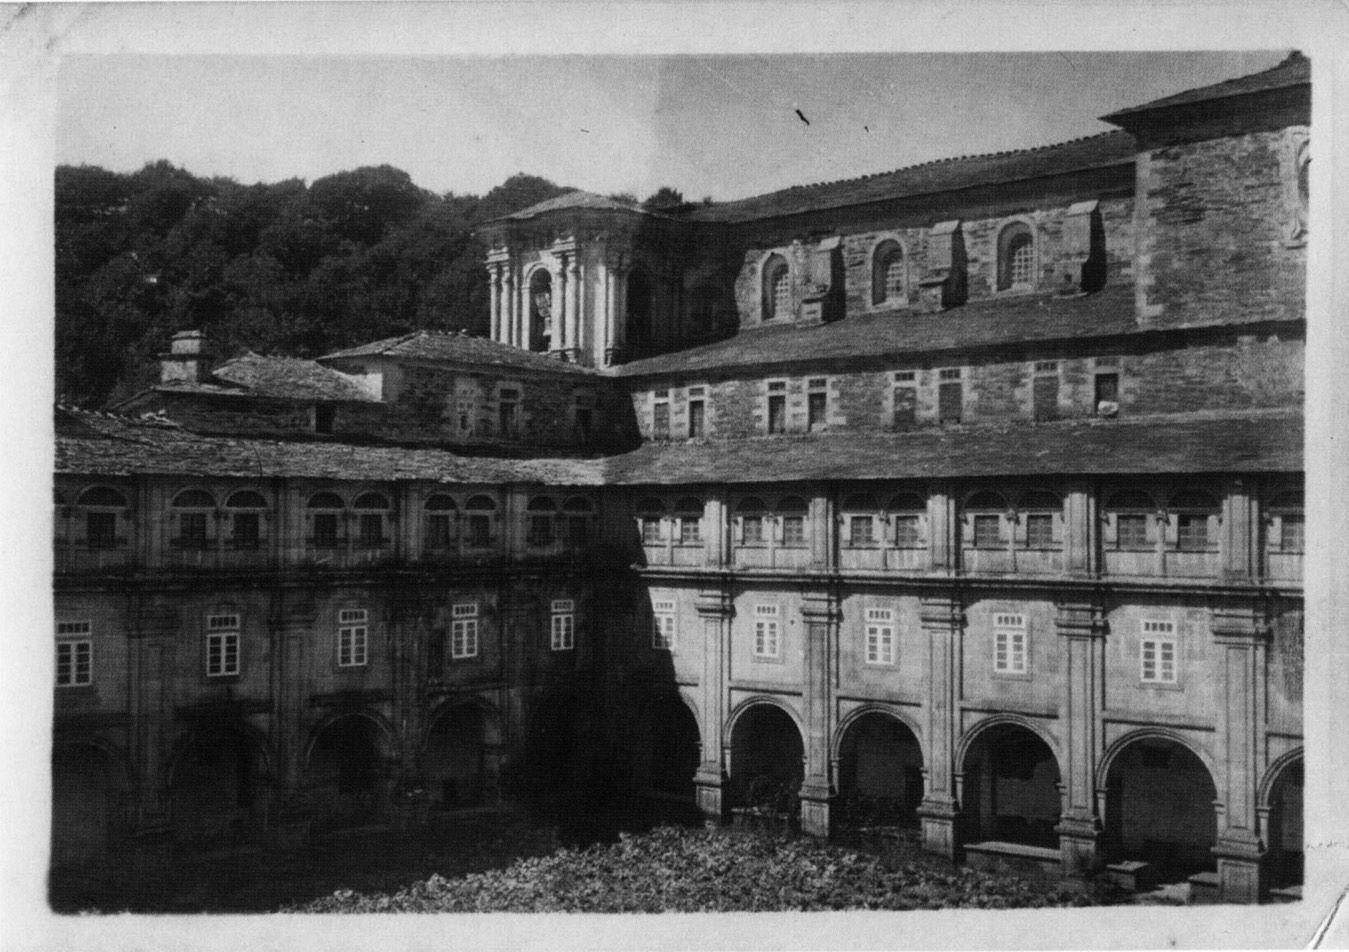 Claustro grande do mosteiro beneditino de San Xiao e Santa Basilisa. Samos, Lugo, ca. 1900. Xelatina de prata ao clorobromuro. 13 x 18 cm.